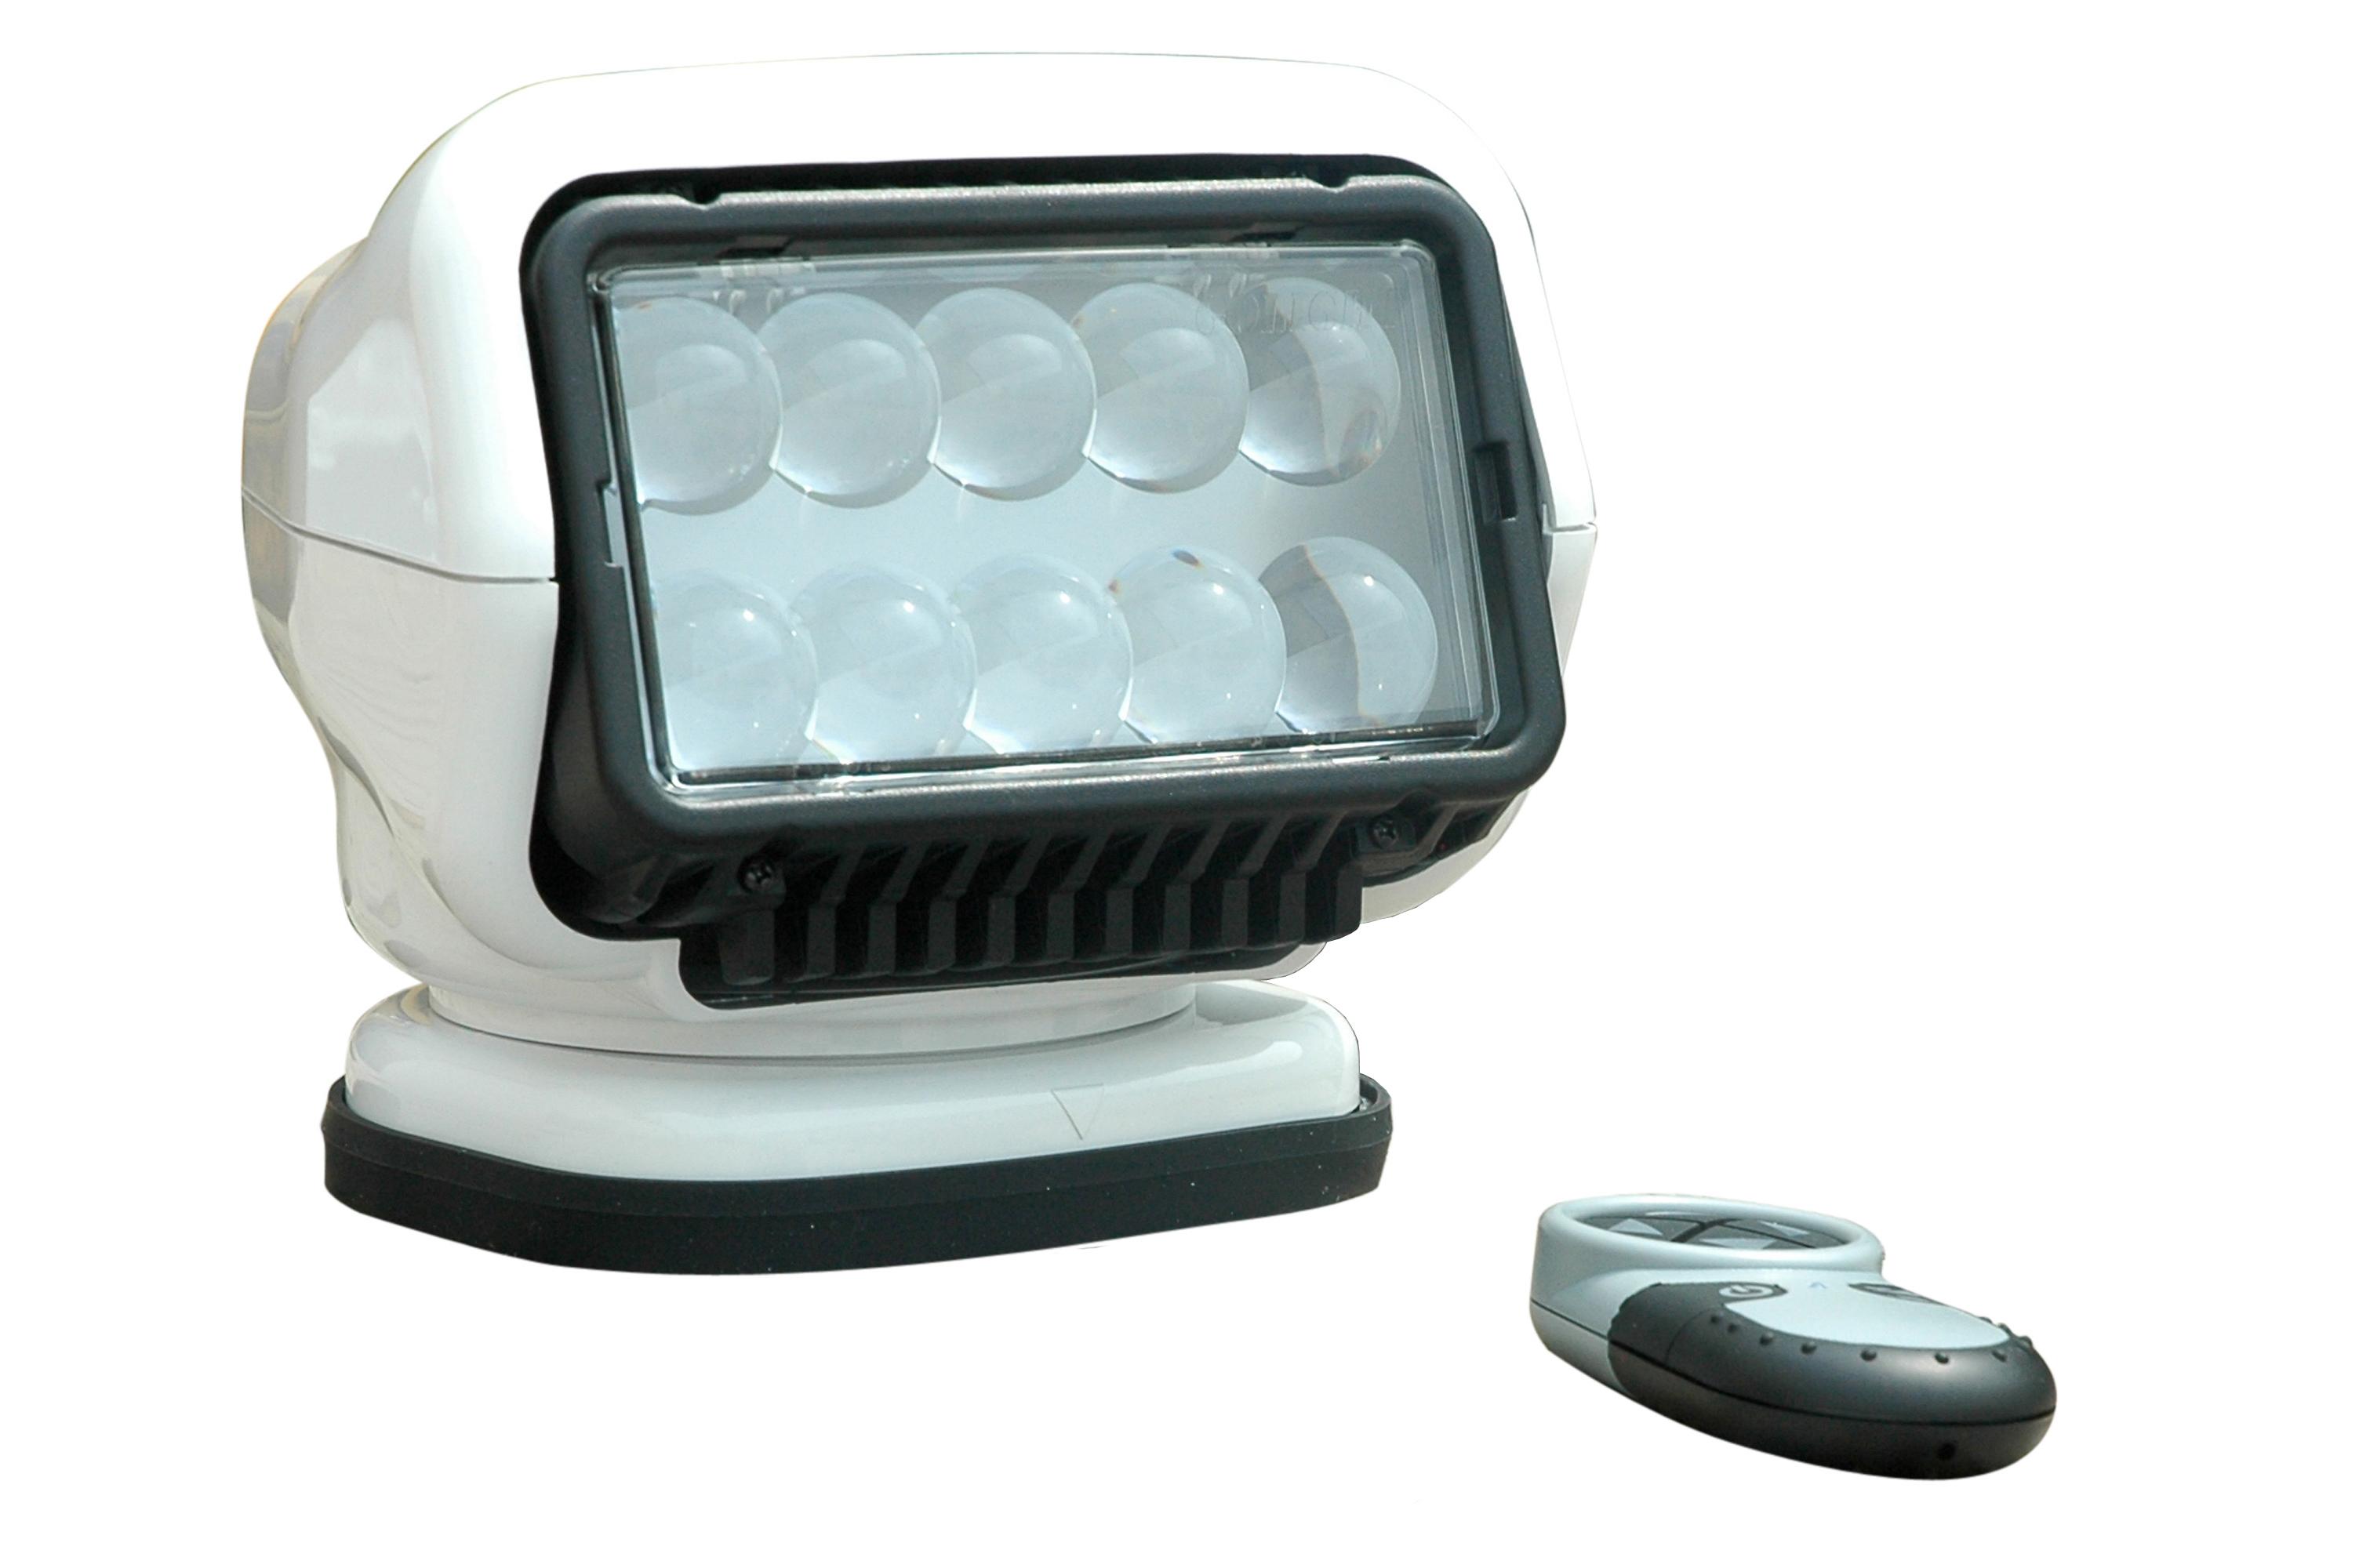 magnetic image golight remotes lighting light mount lumen p hid res w stryker hi go volt wireless watt